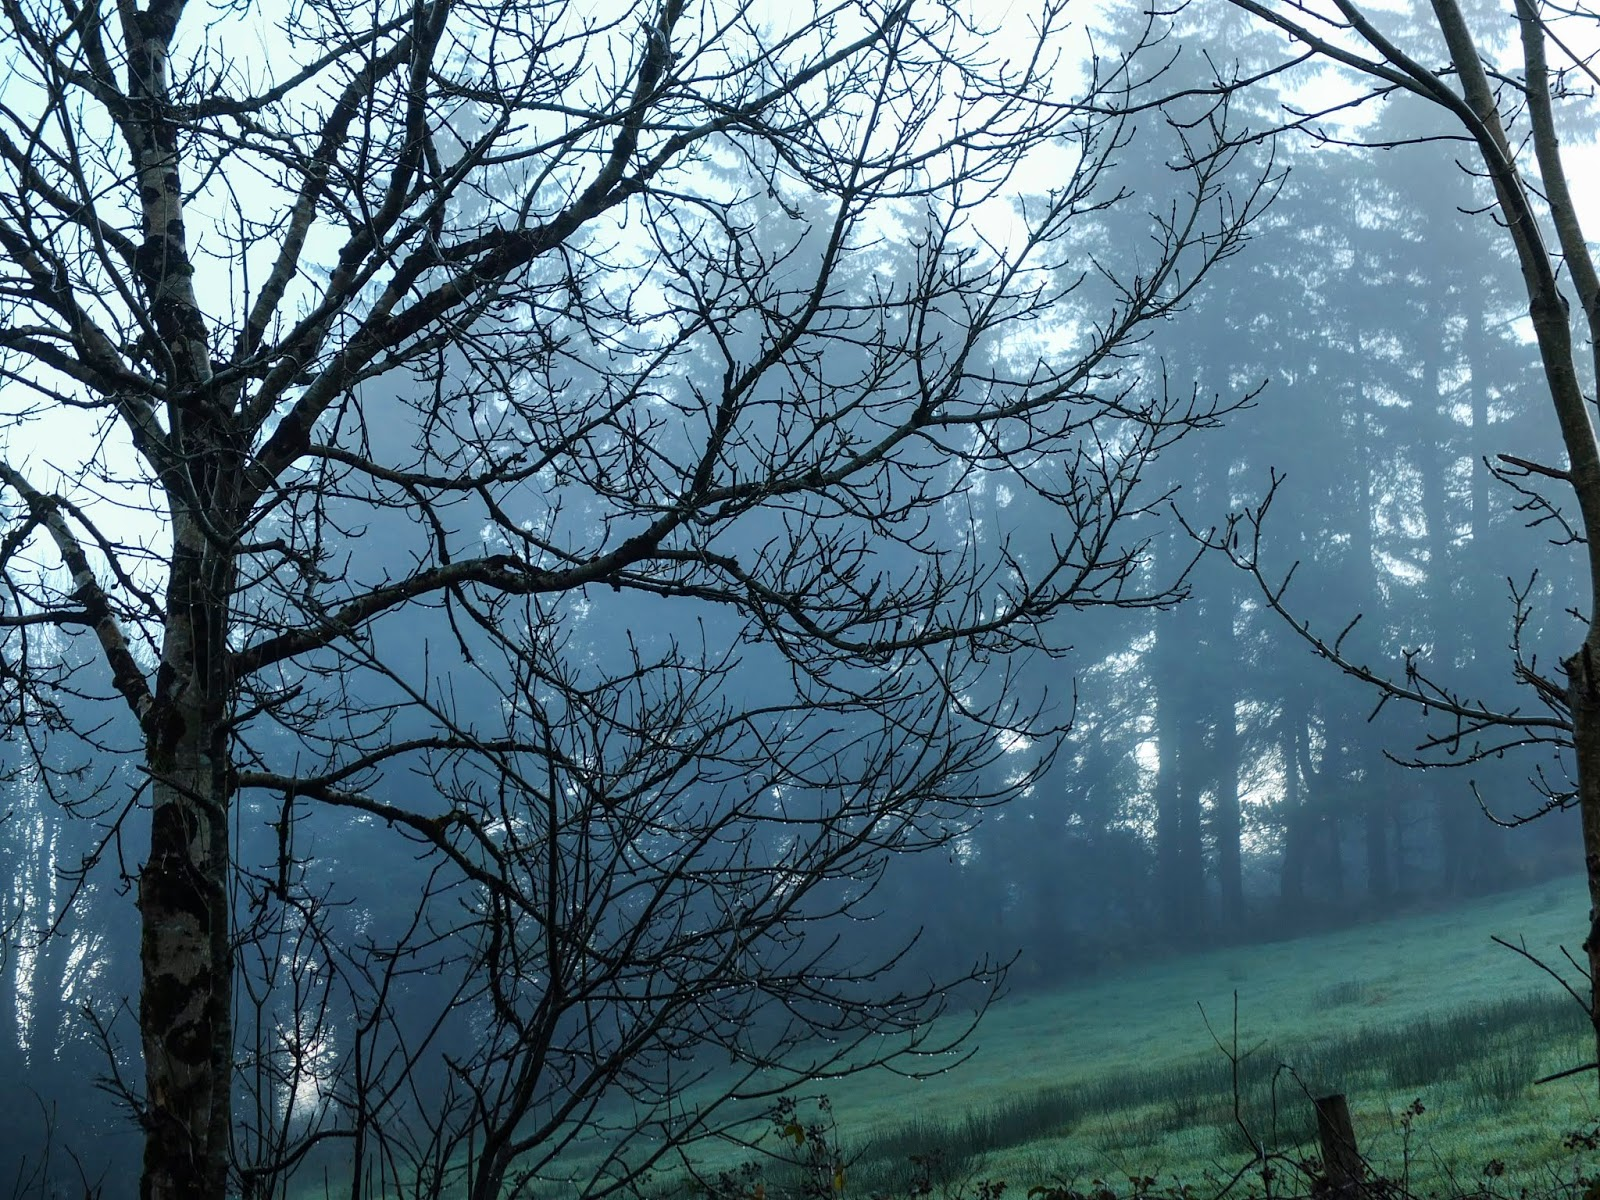 Fog covered hill side in North Cork on a misty November morning.